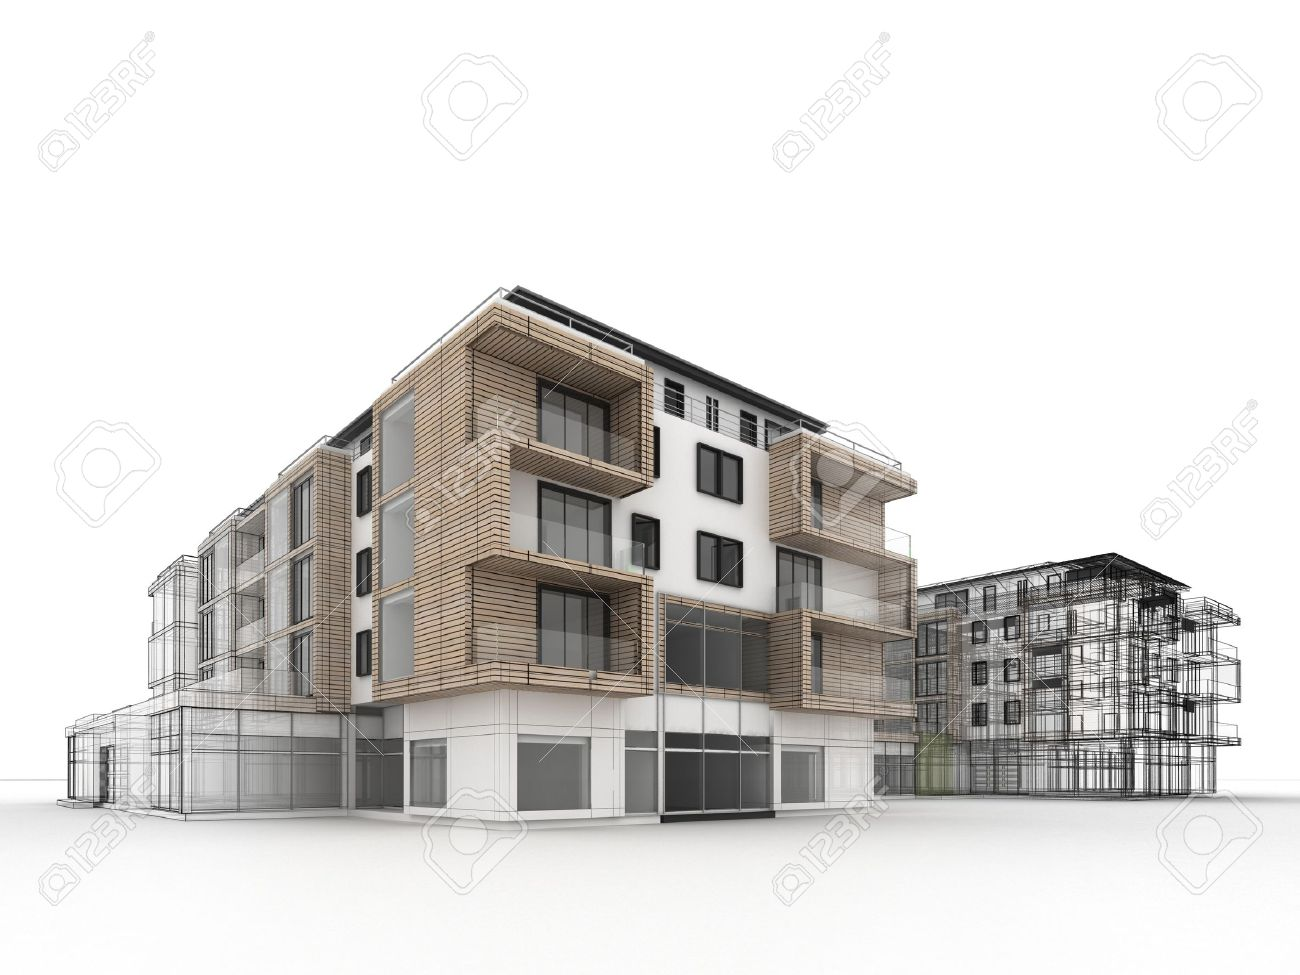 Stunning Architecture Moderne Maison Dessin Images - Design Trends ...